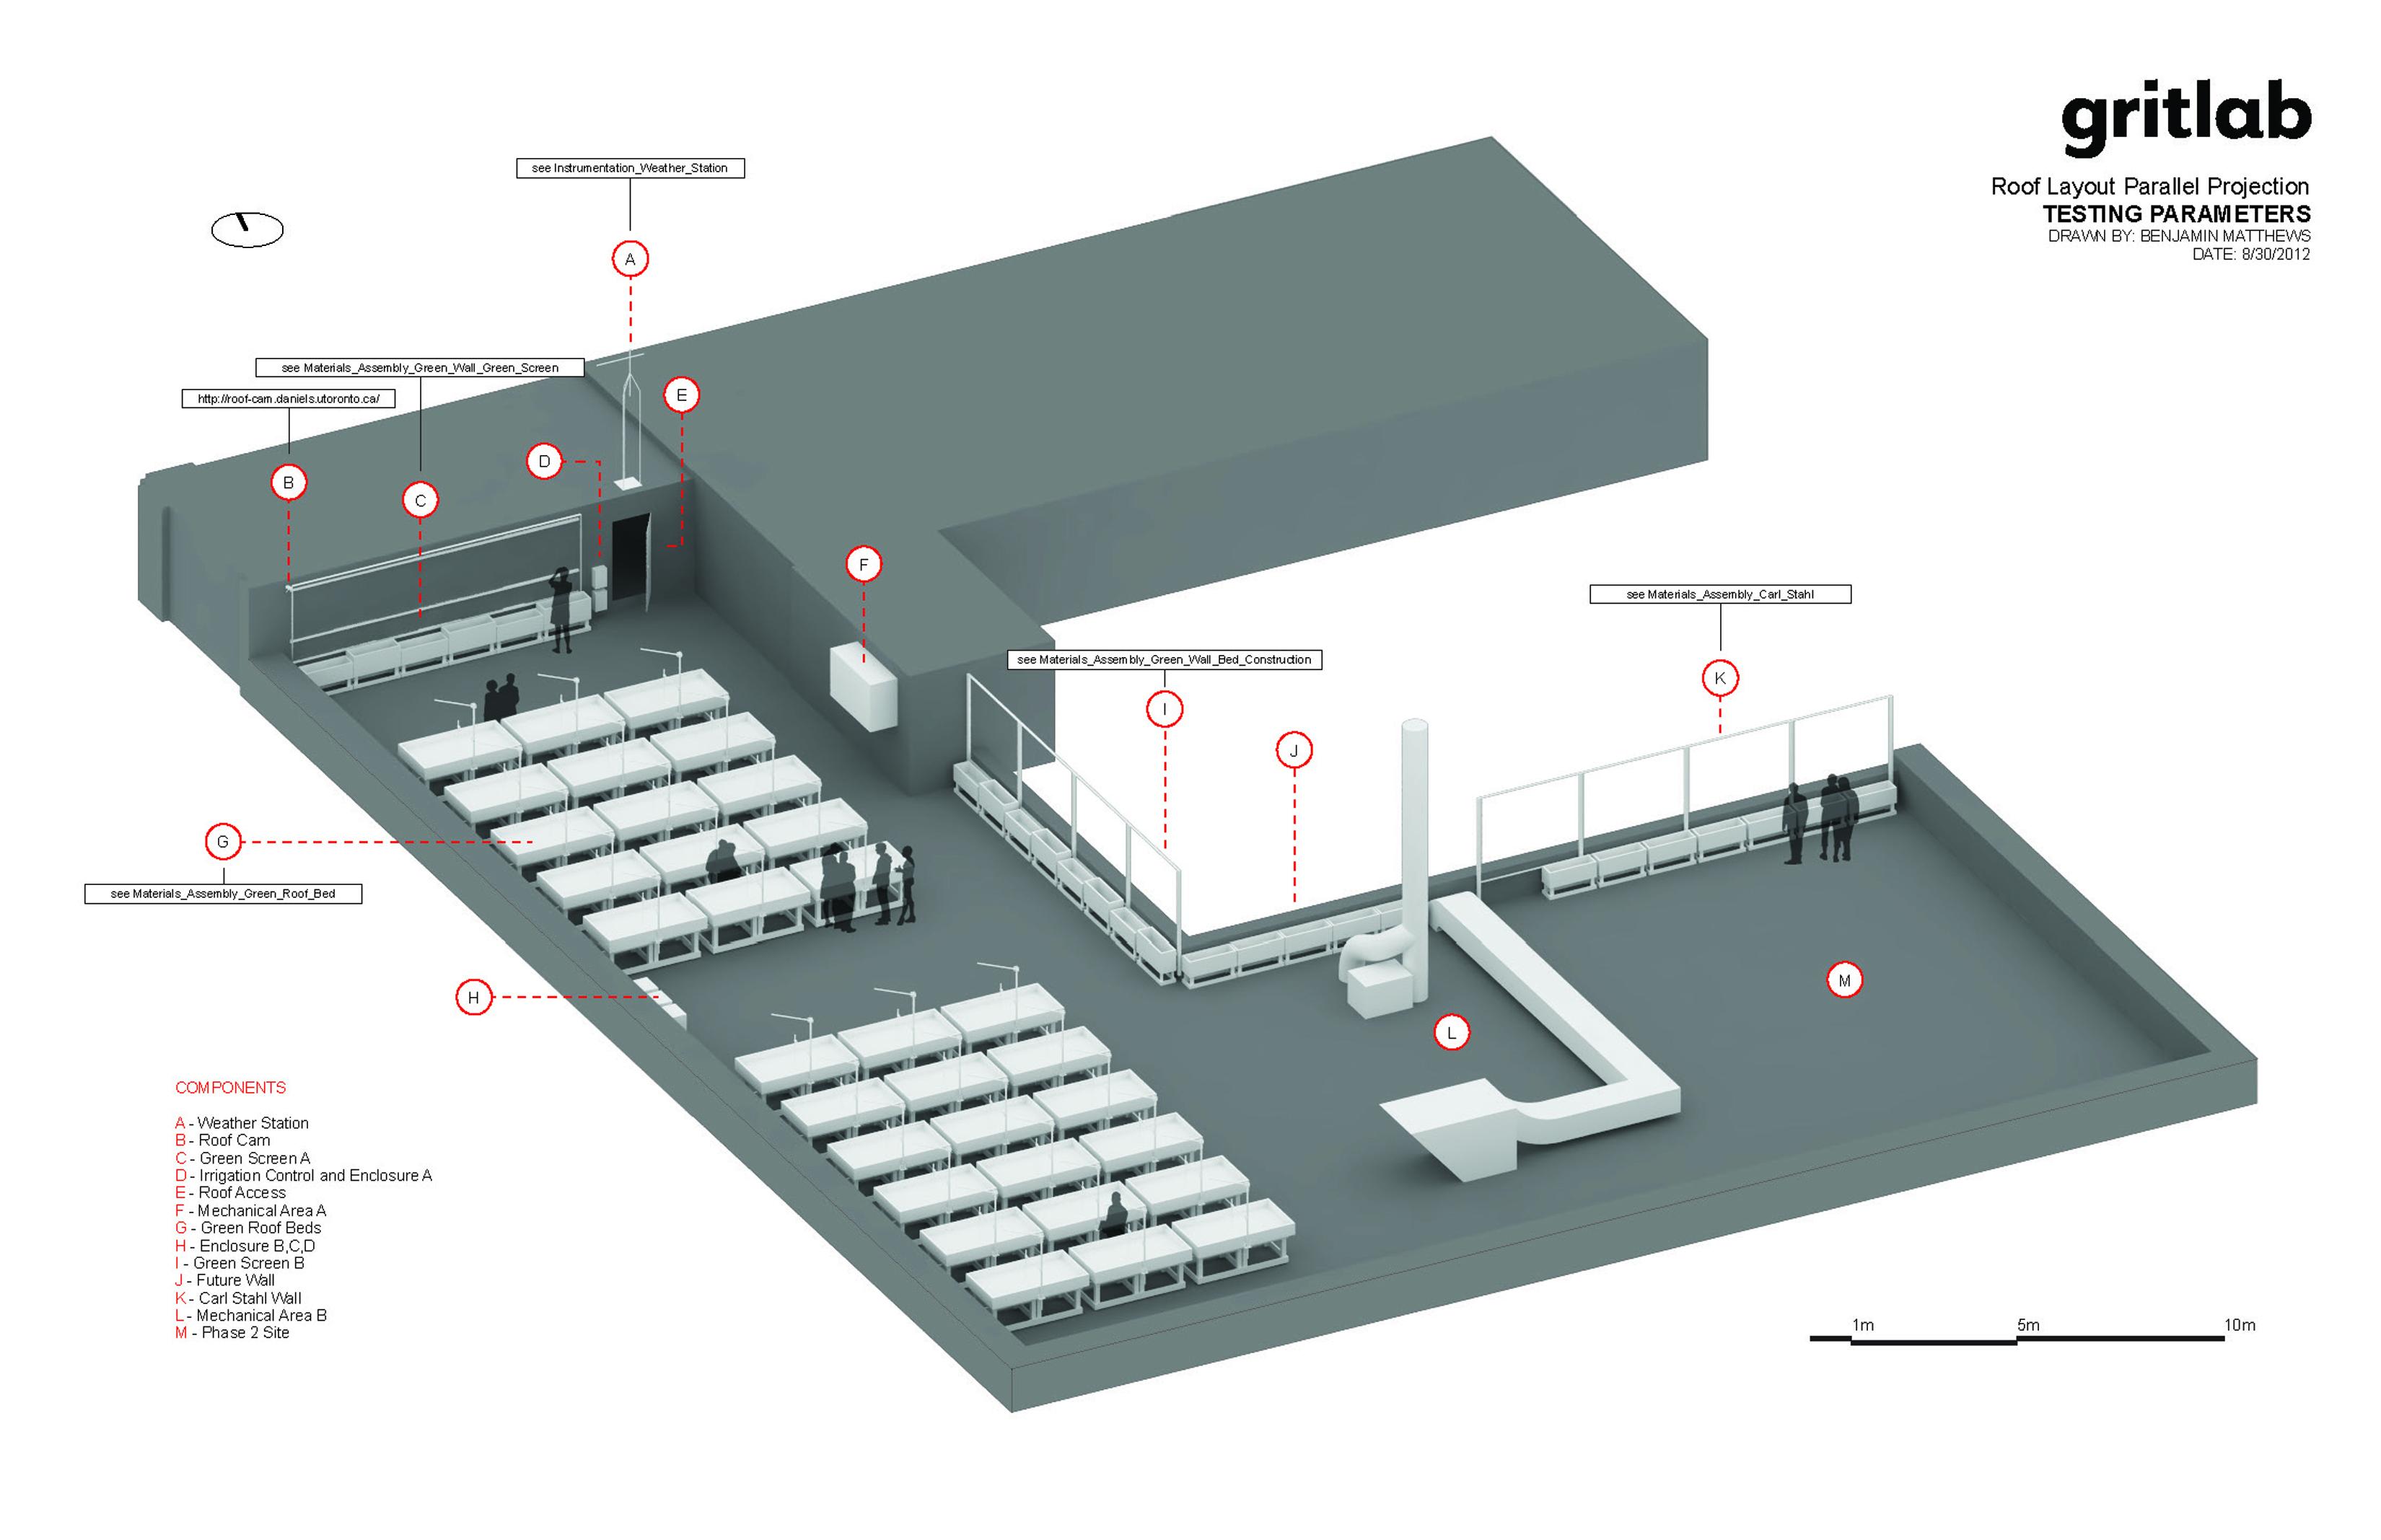 Asla 2013 Professional Awards Green Roof Innovation